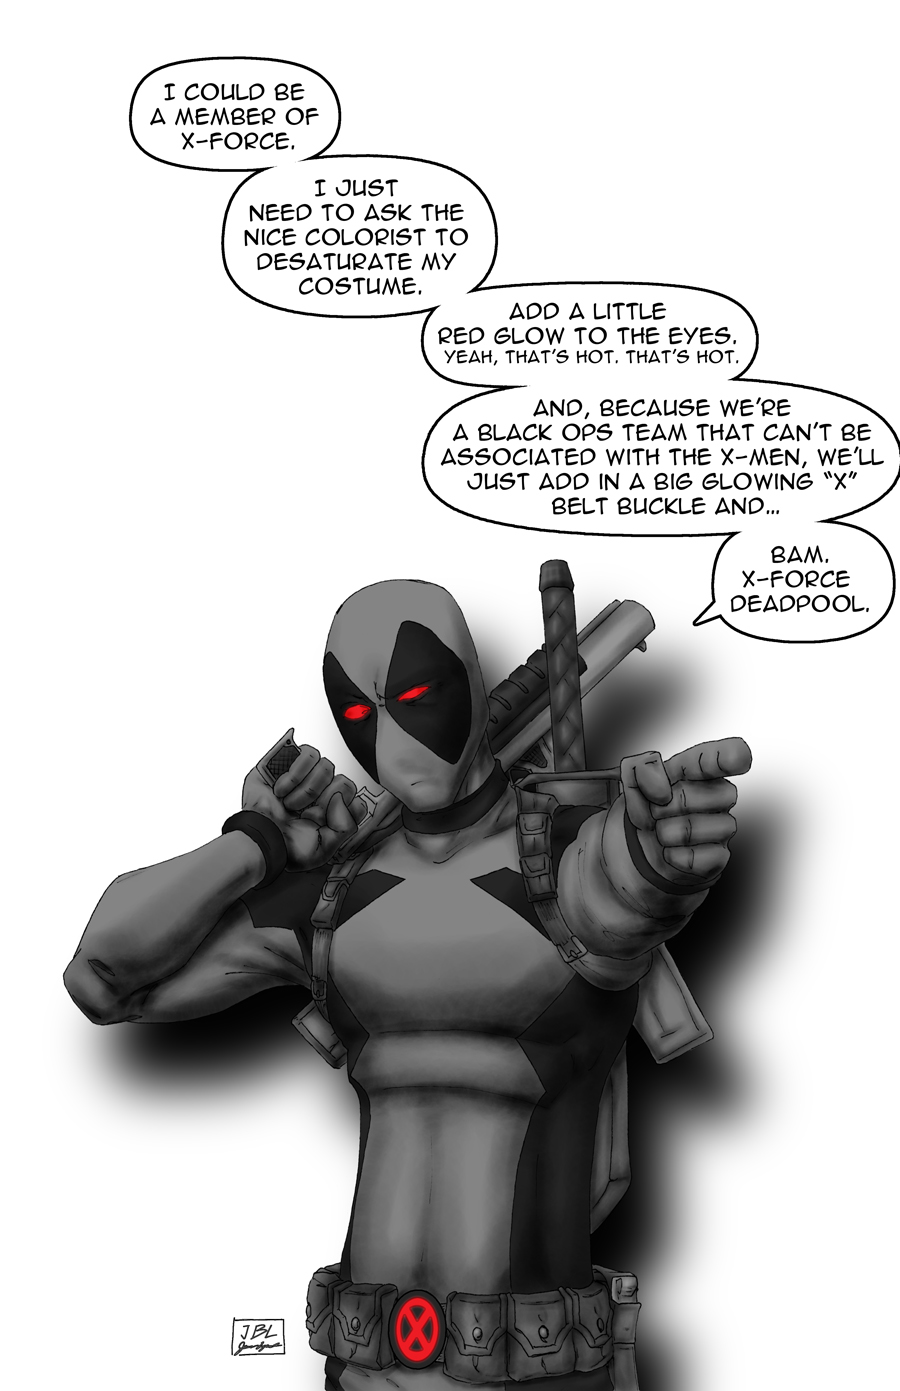 Force Deadpool by JamesLynch 900x1391